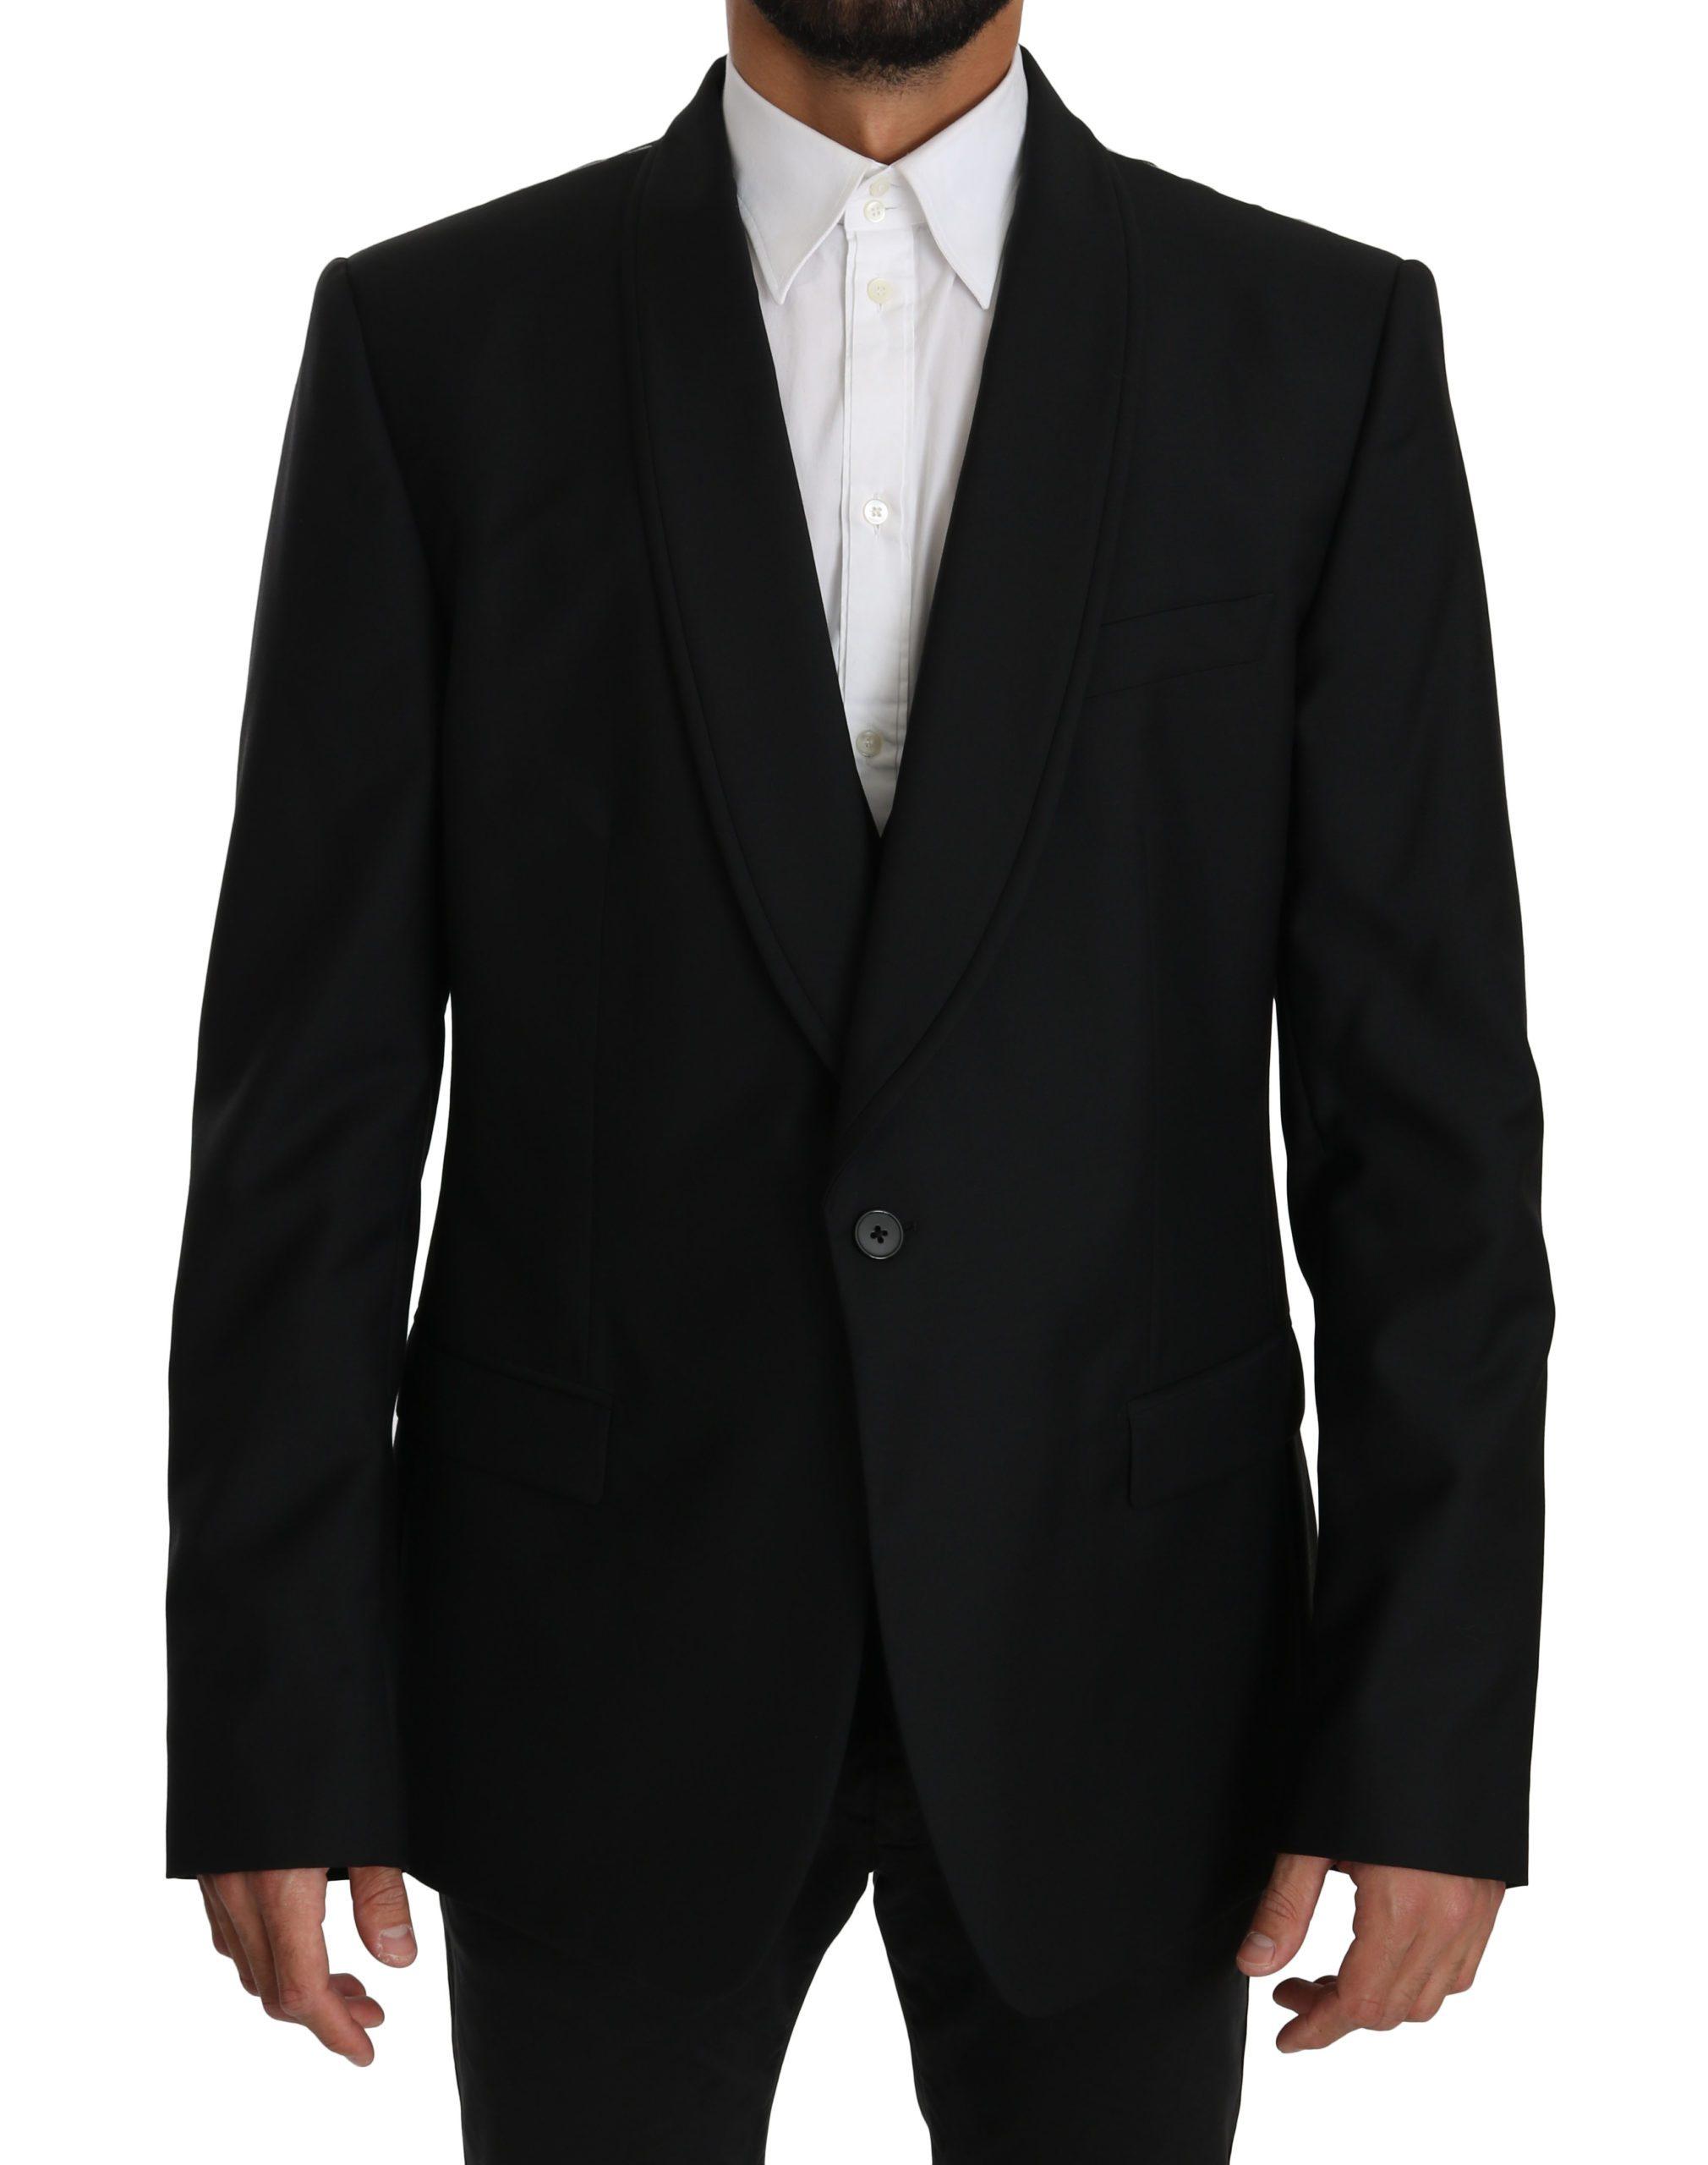 Dolce & Gabbana Men's Wool Two Piece Vest Blazer Black KOS1601 - IT56 | XXL